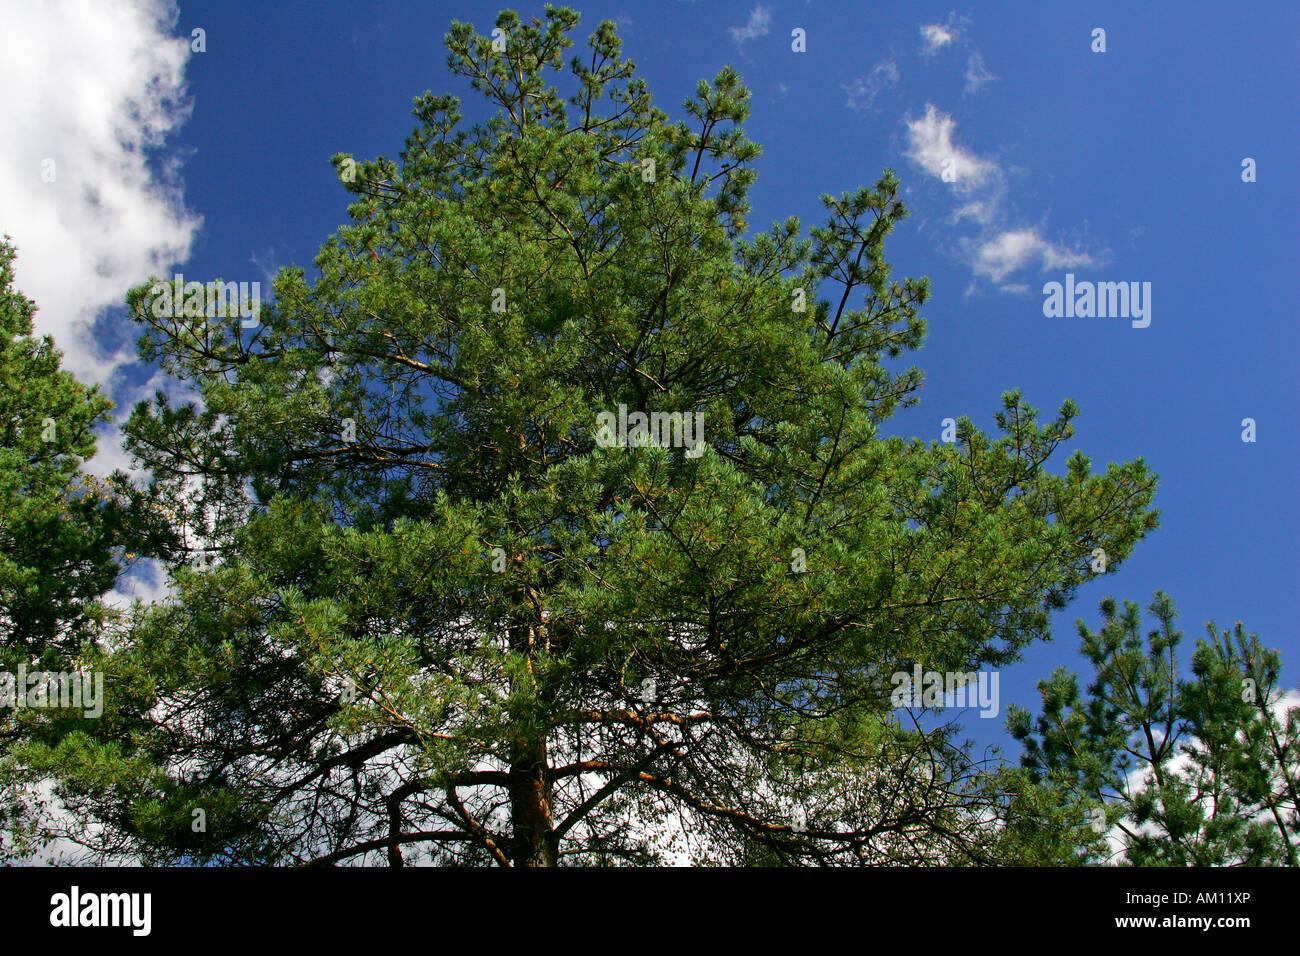 Scotch pine - scots pine - conifer - (Pinus sylvestris) - Stock Image